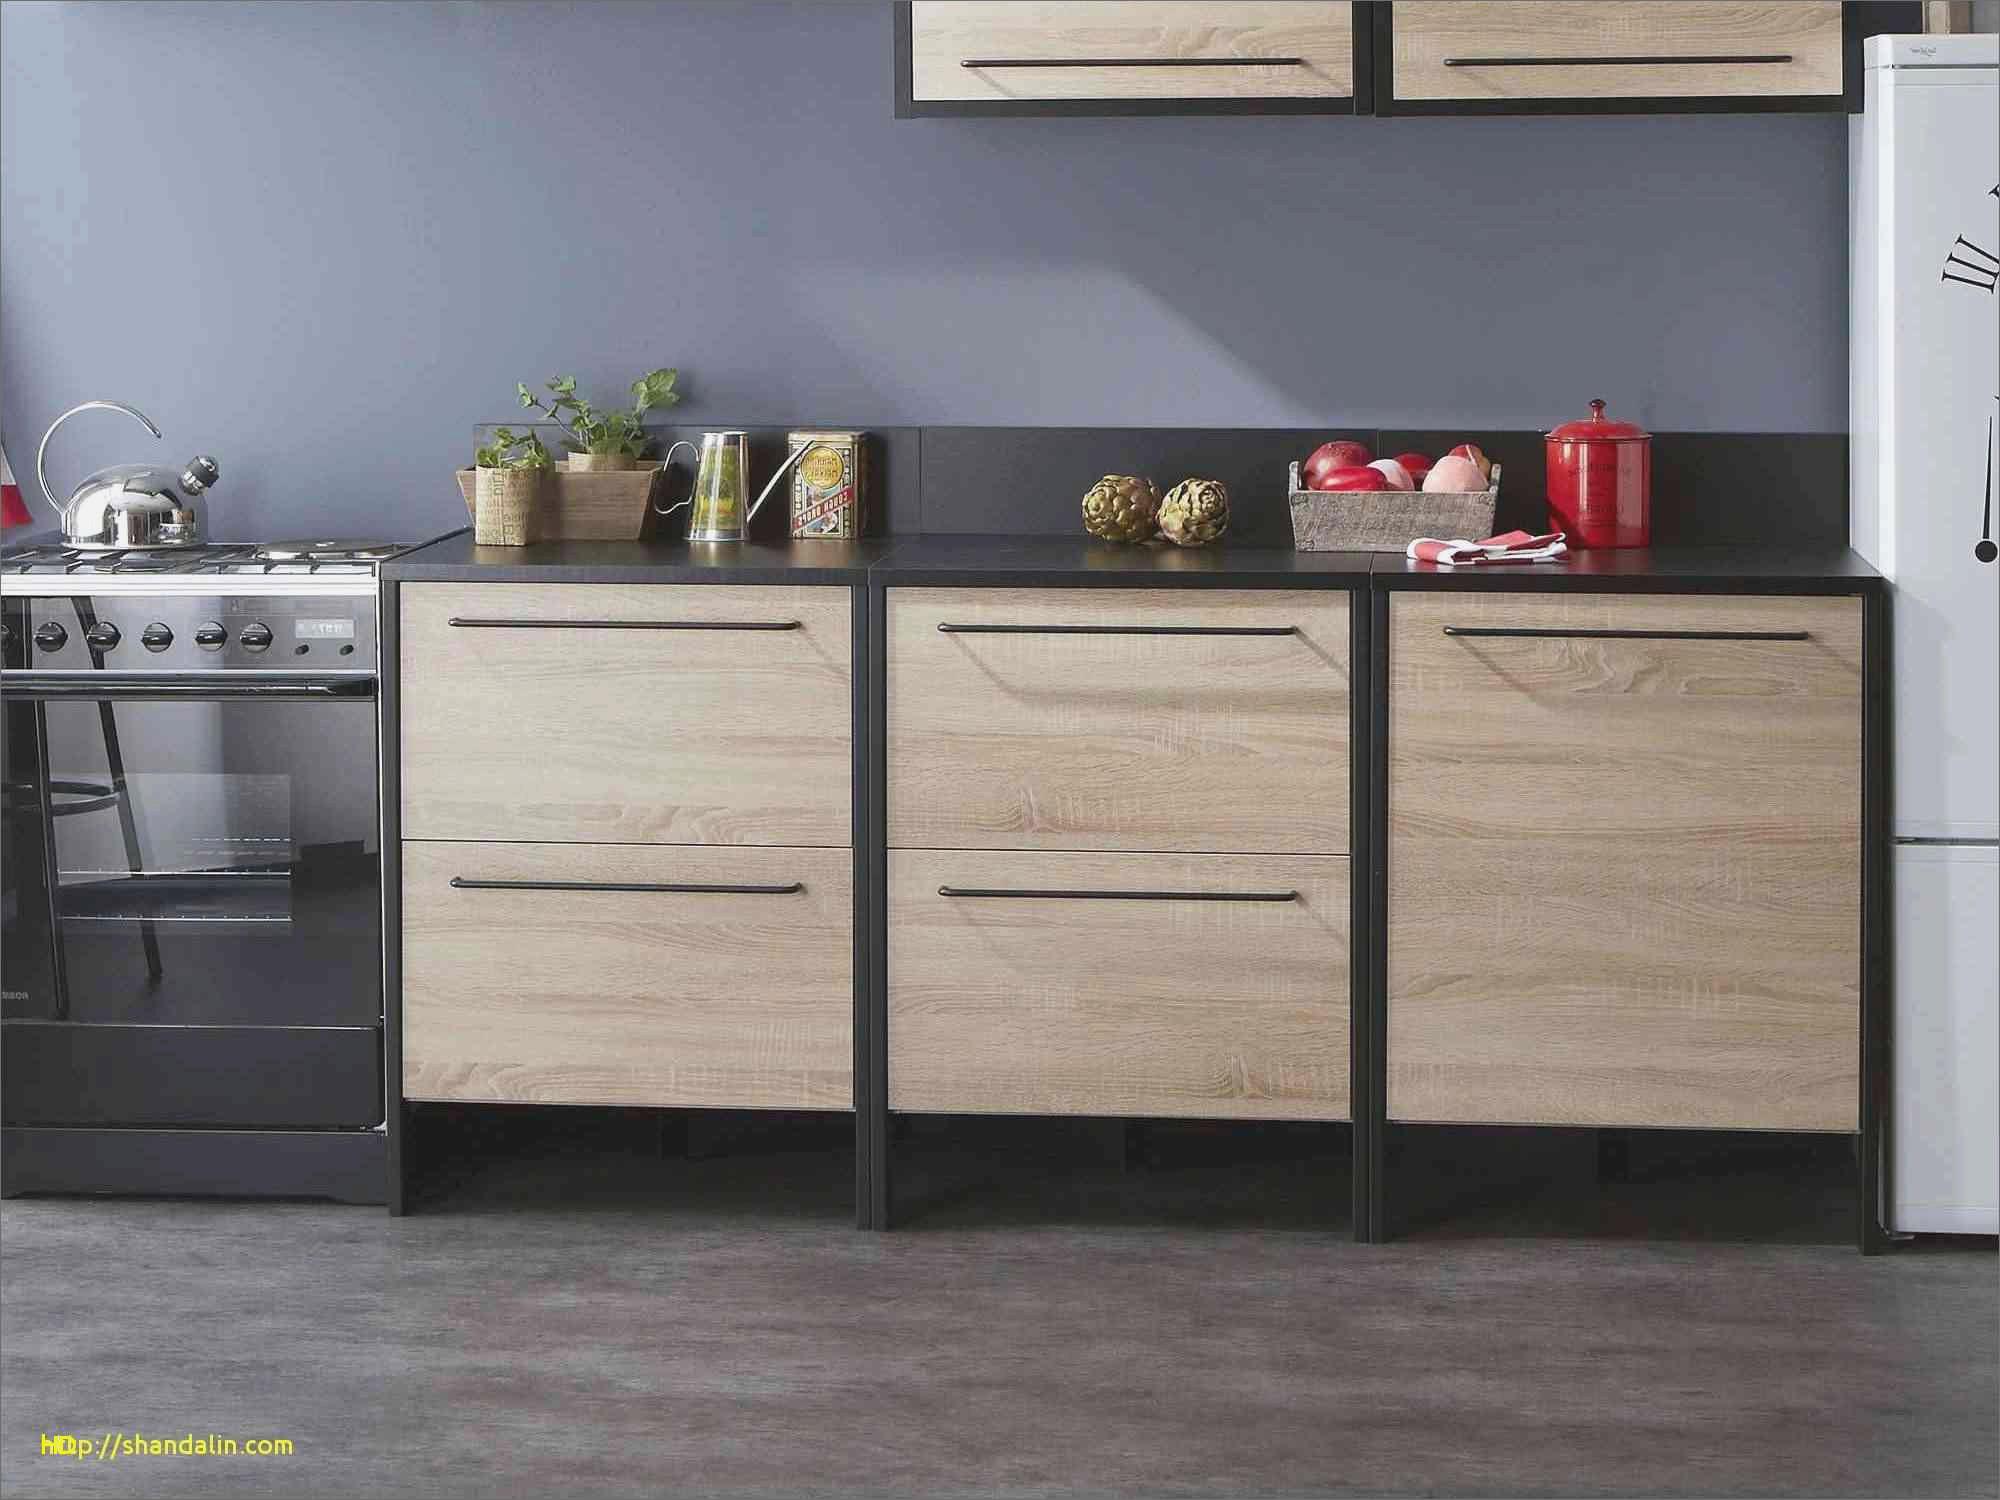 les aubaines meubles les aubaines meubles roubaix genial buffet bas cuisine of les aubaines meubles